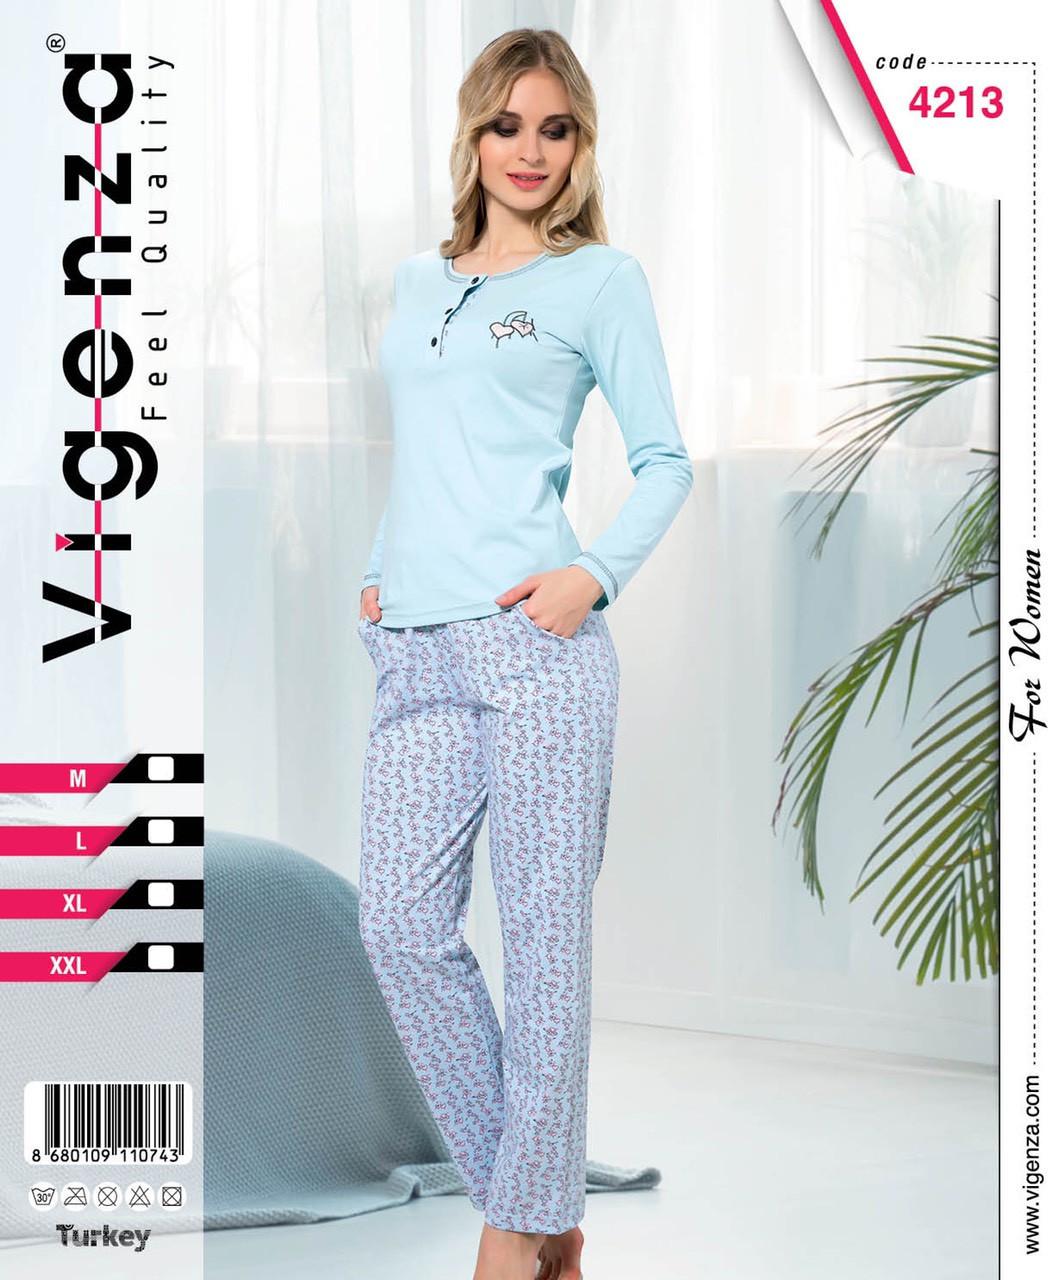 e2bfd6229043f Пижама для женщин штаны и кофта , цена 530 грн., купить в Харькове —  Prom.ua (ID#840044888)